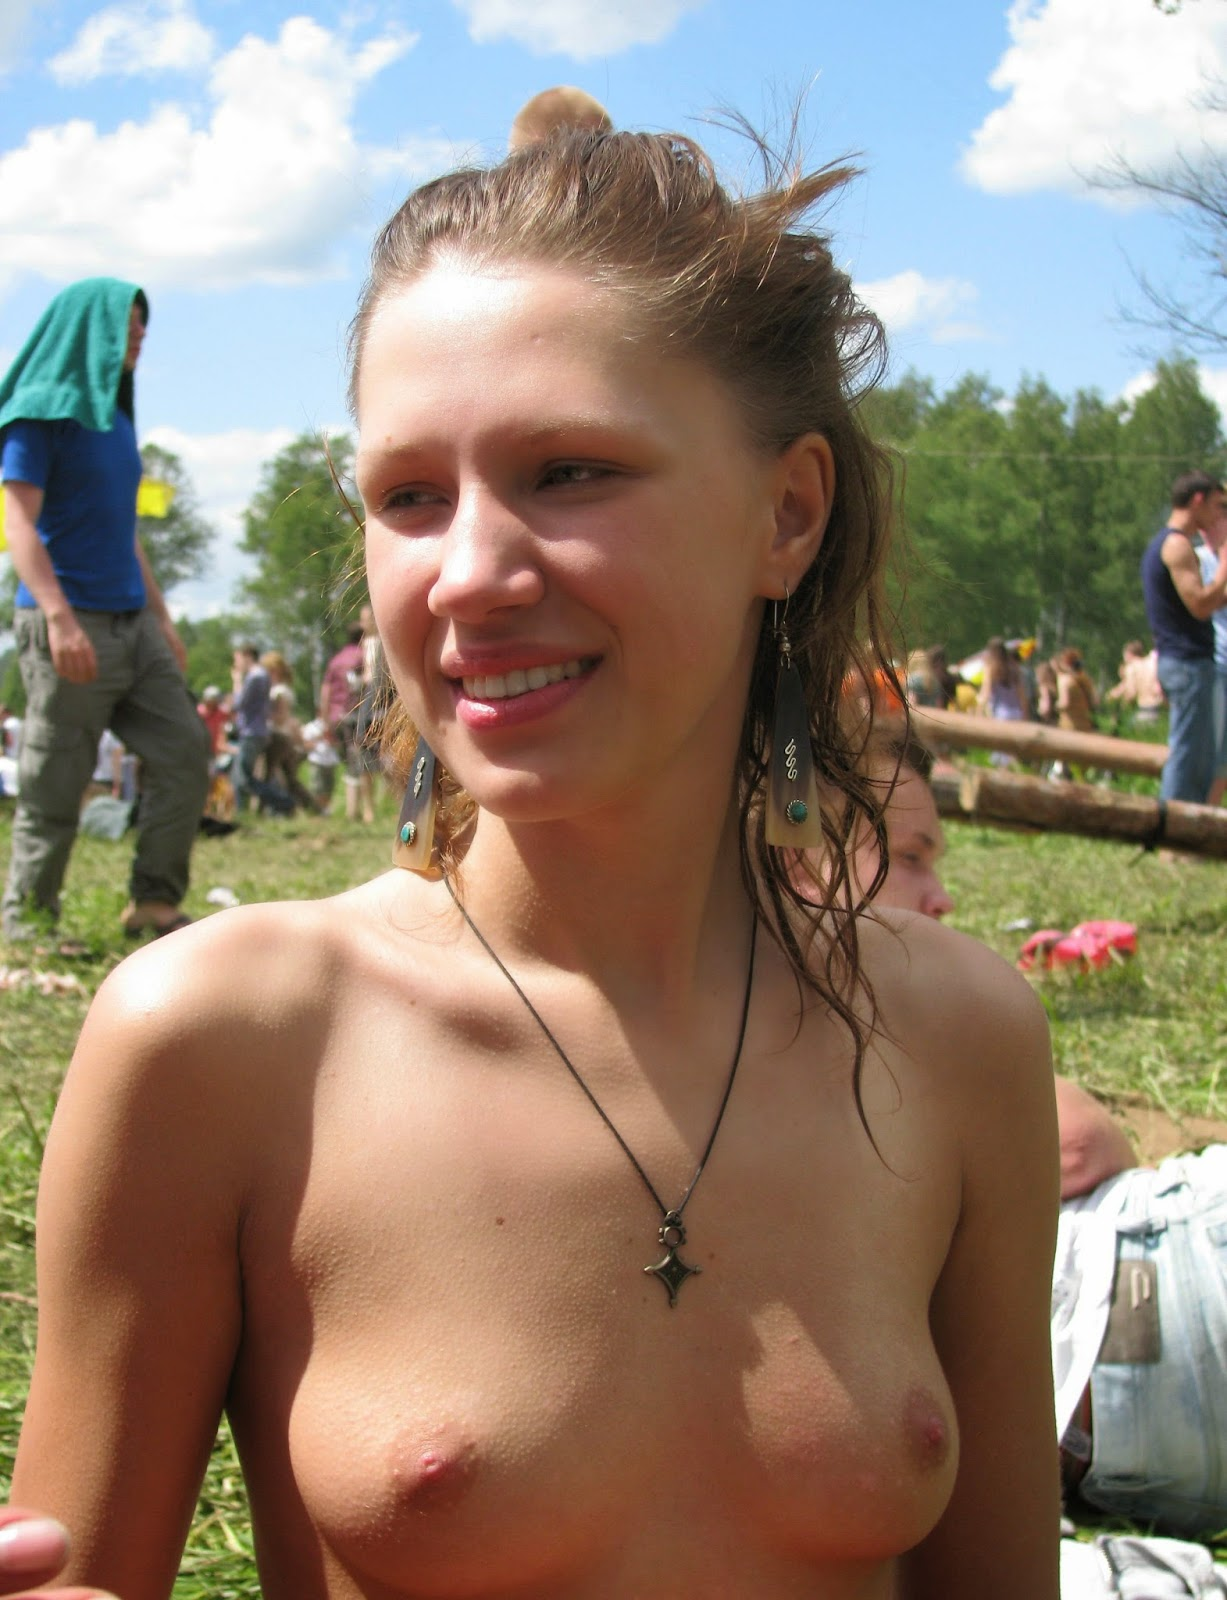 Russian nudist pics limp